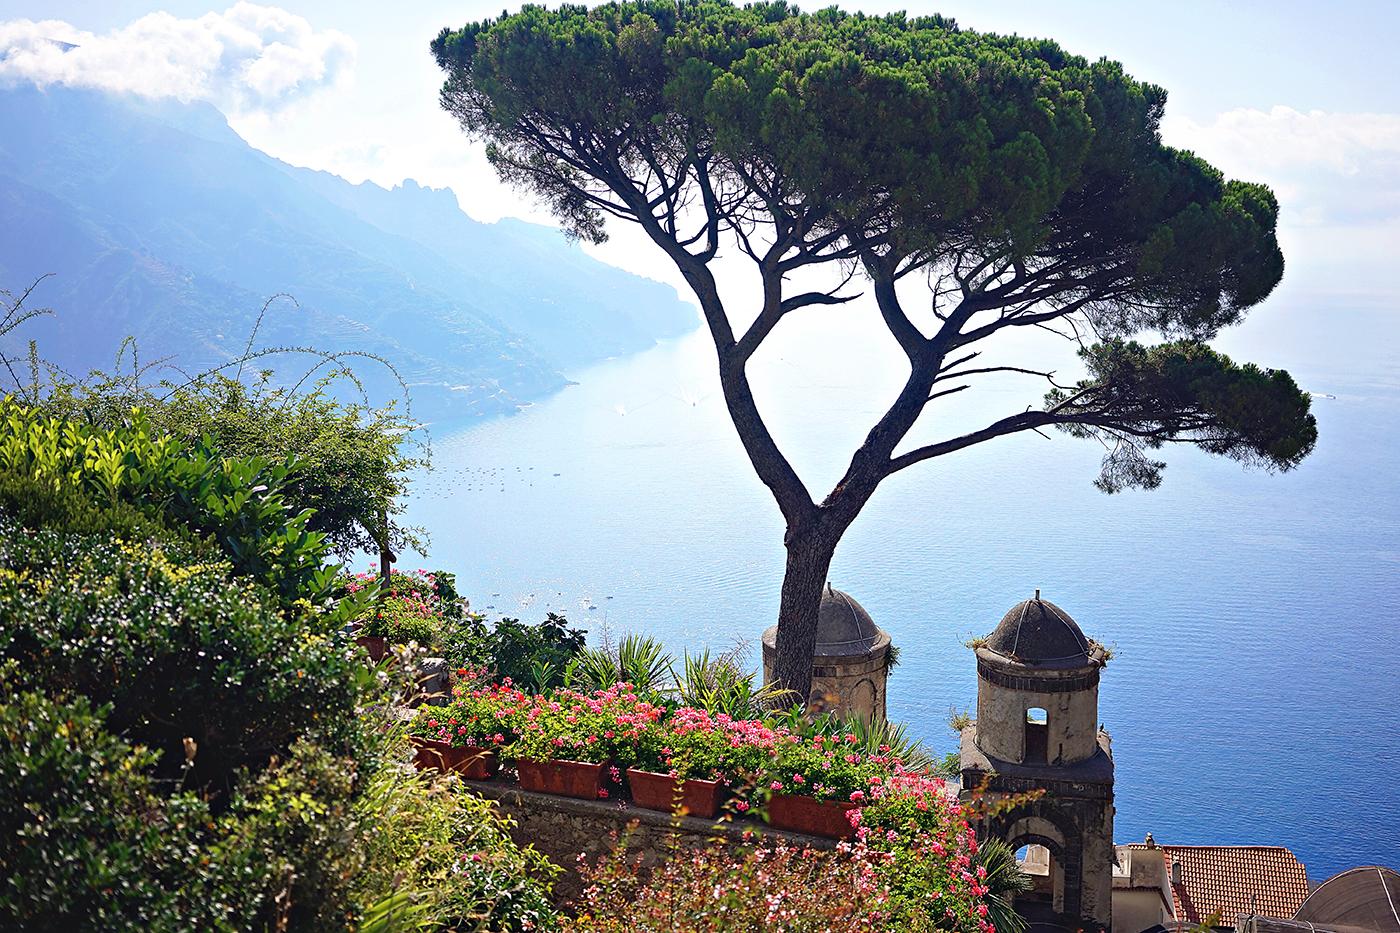 Traveling Italian Style: A Day Trip Through the Amalfi Coast